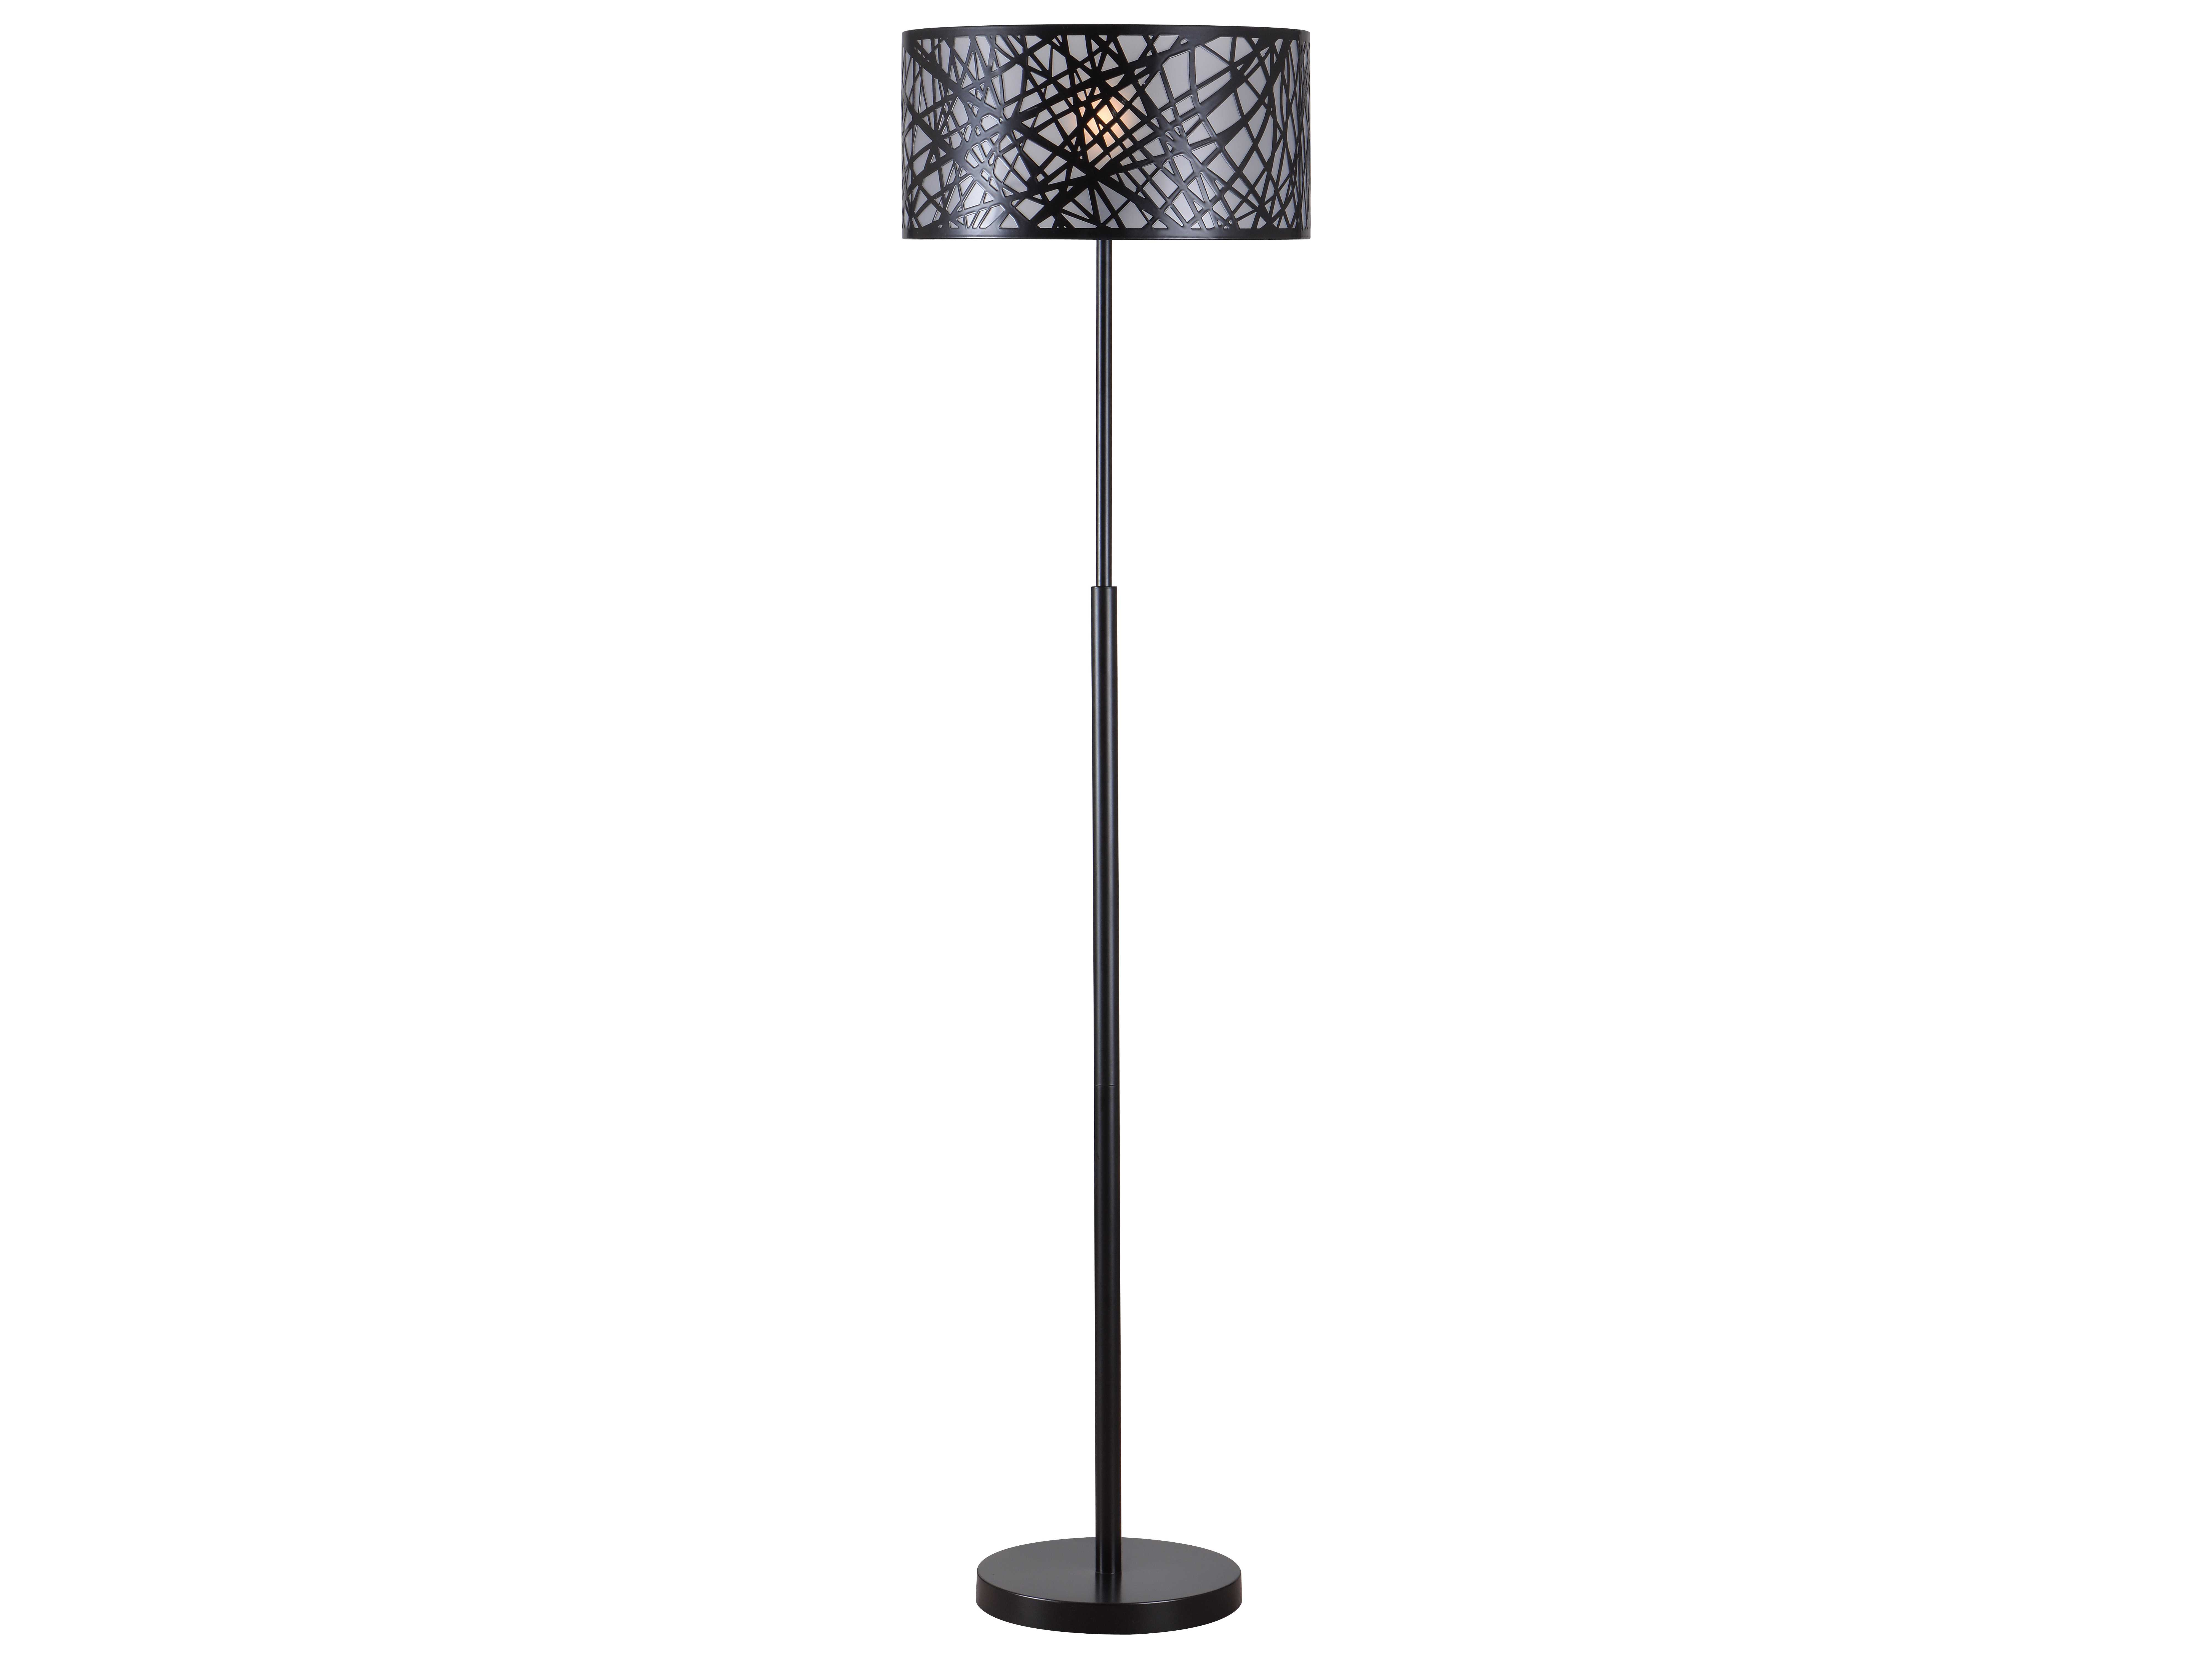 Kenroy home bramble black floor lamp 32771bl - Kenay home lamparas ...